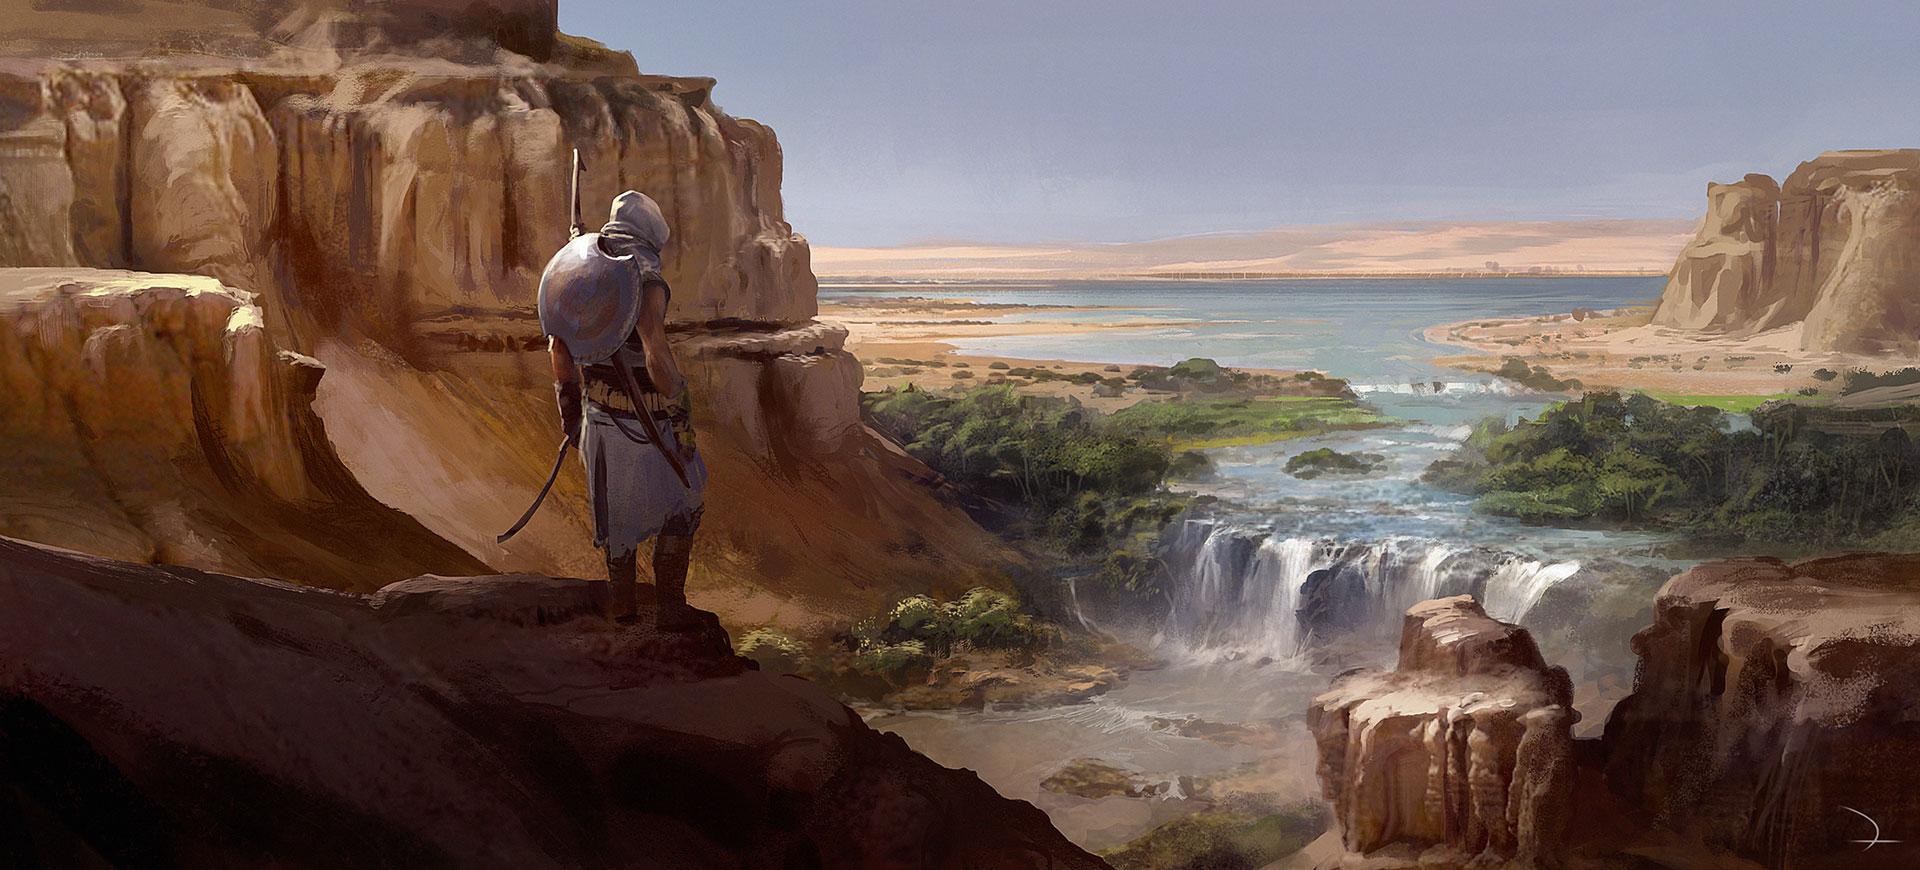 assassin's creed origins (14)